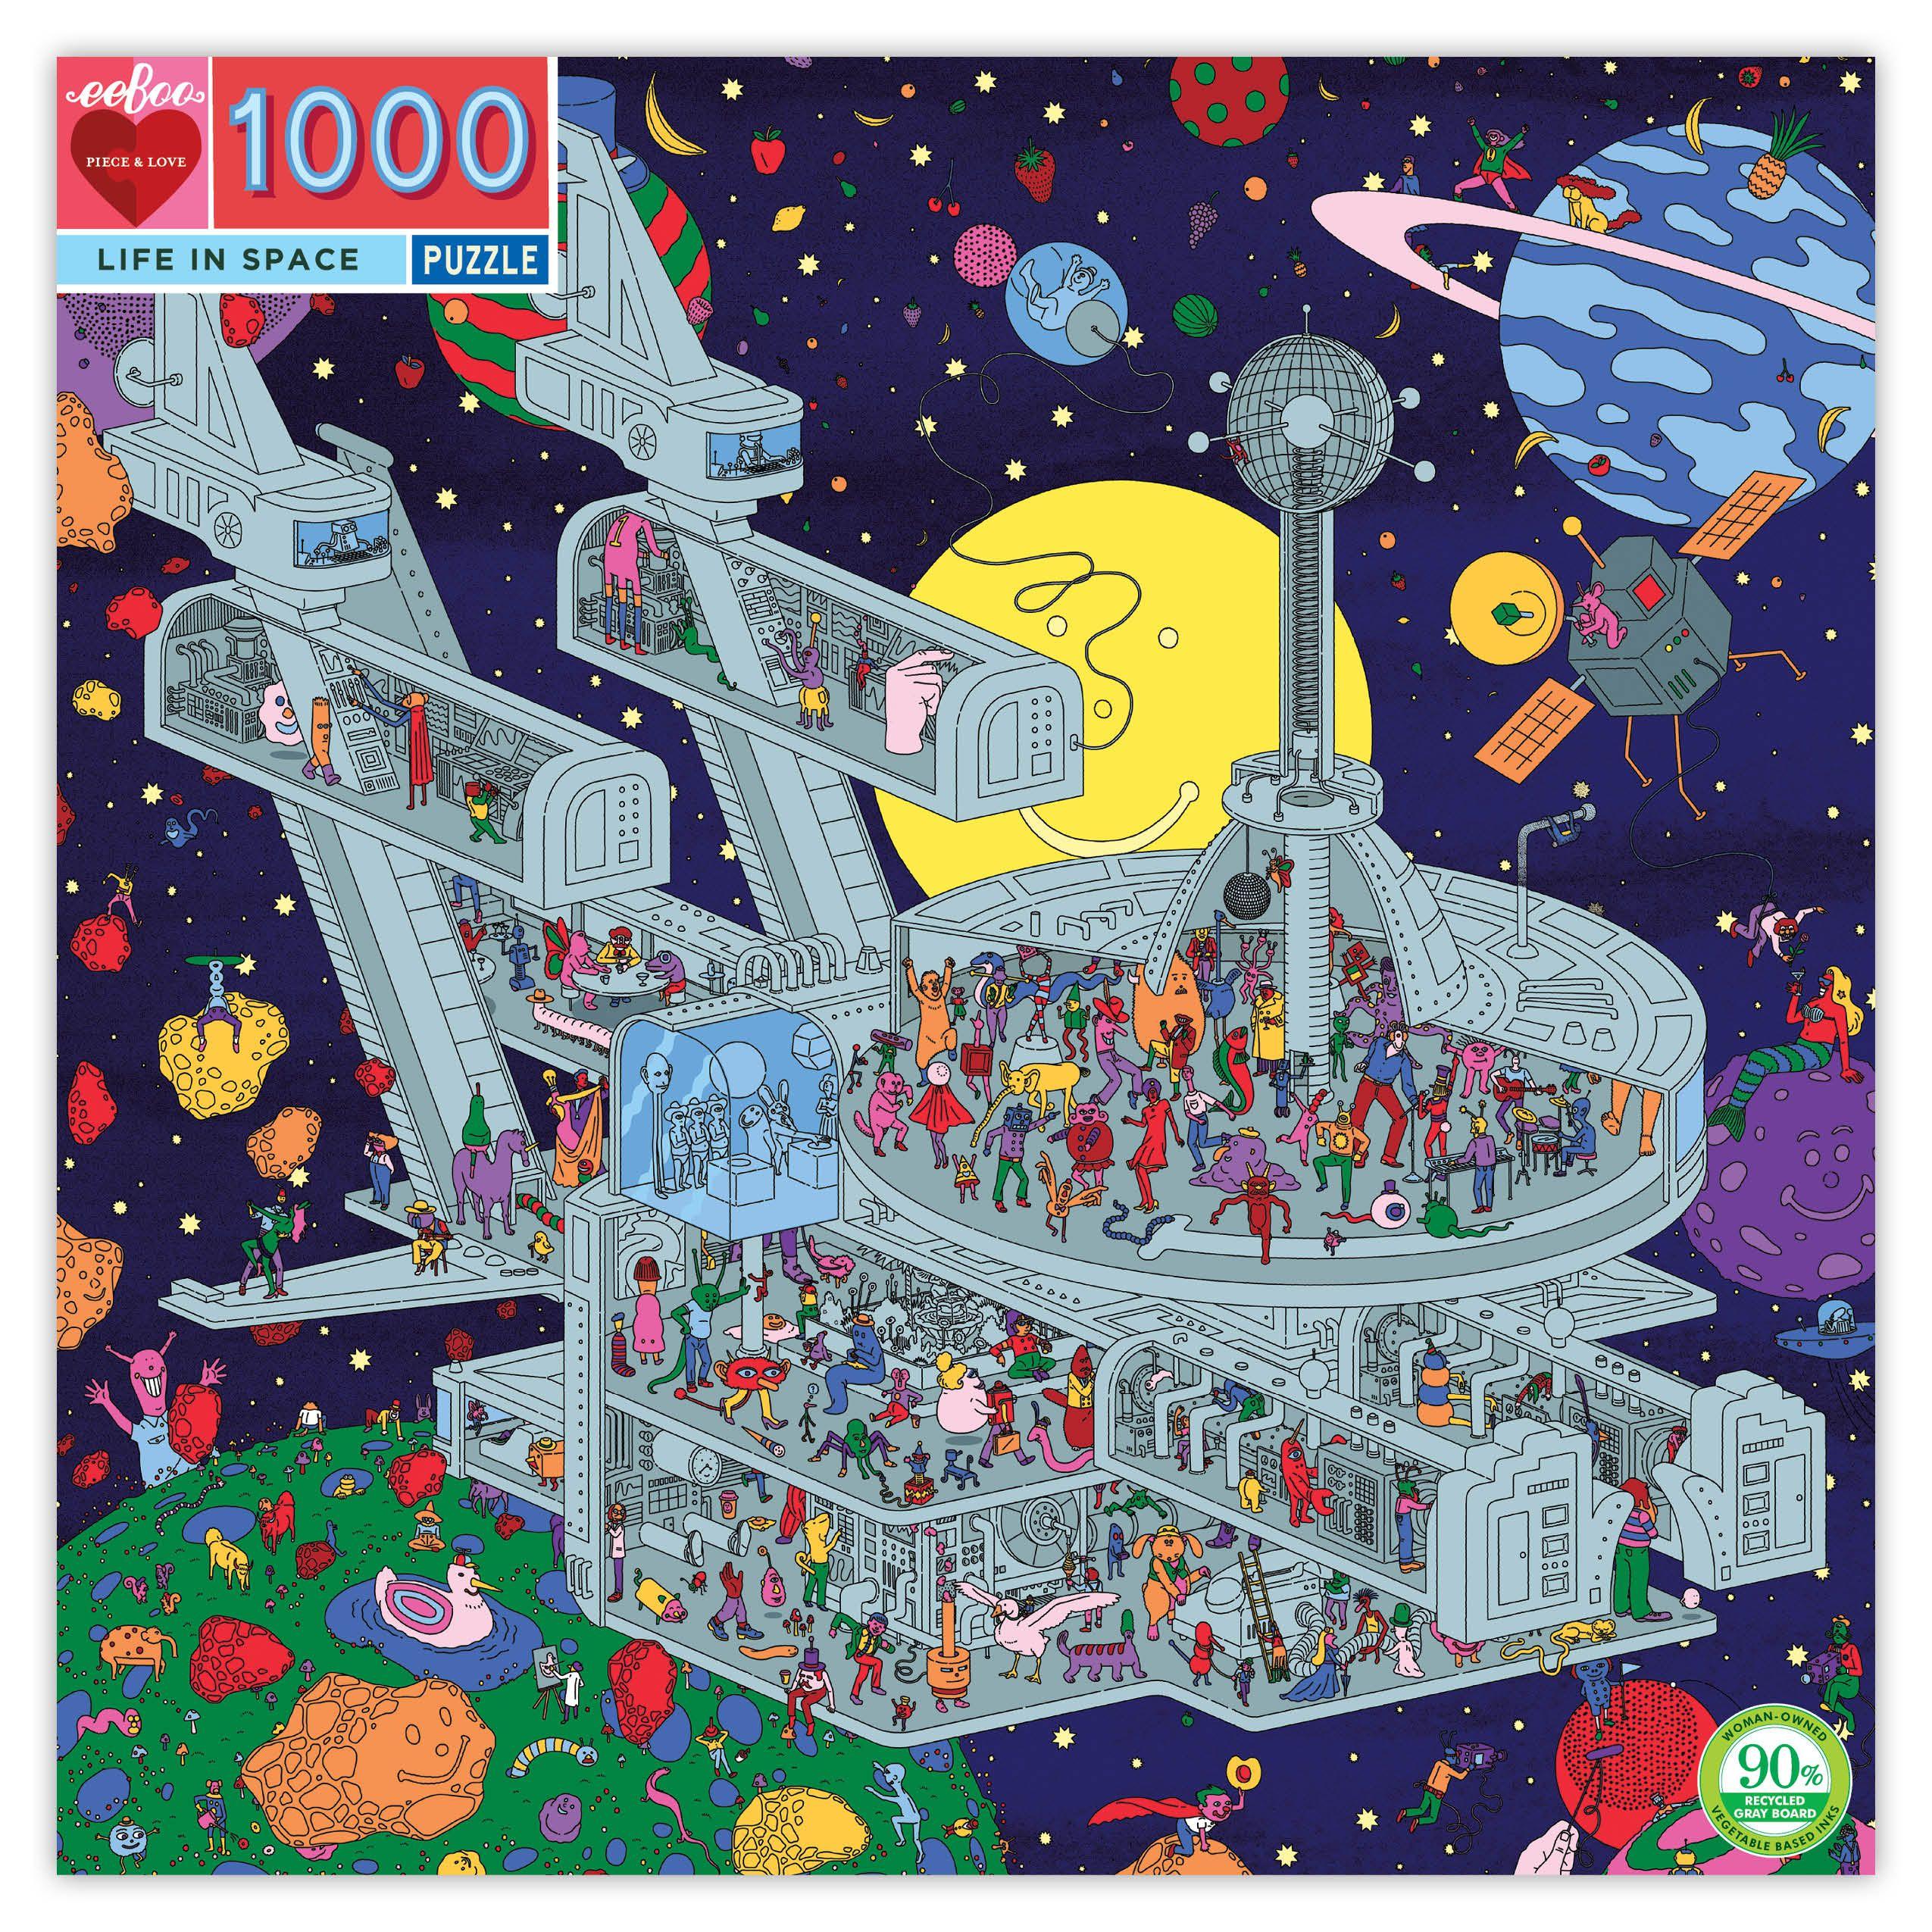 54 Best eeBoo Jigsaw Puzzles #pieceandlove images | Jigsaw puzzles ...